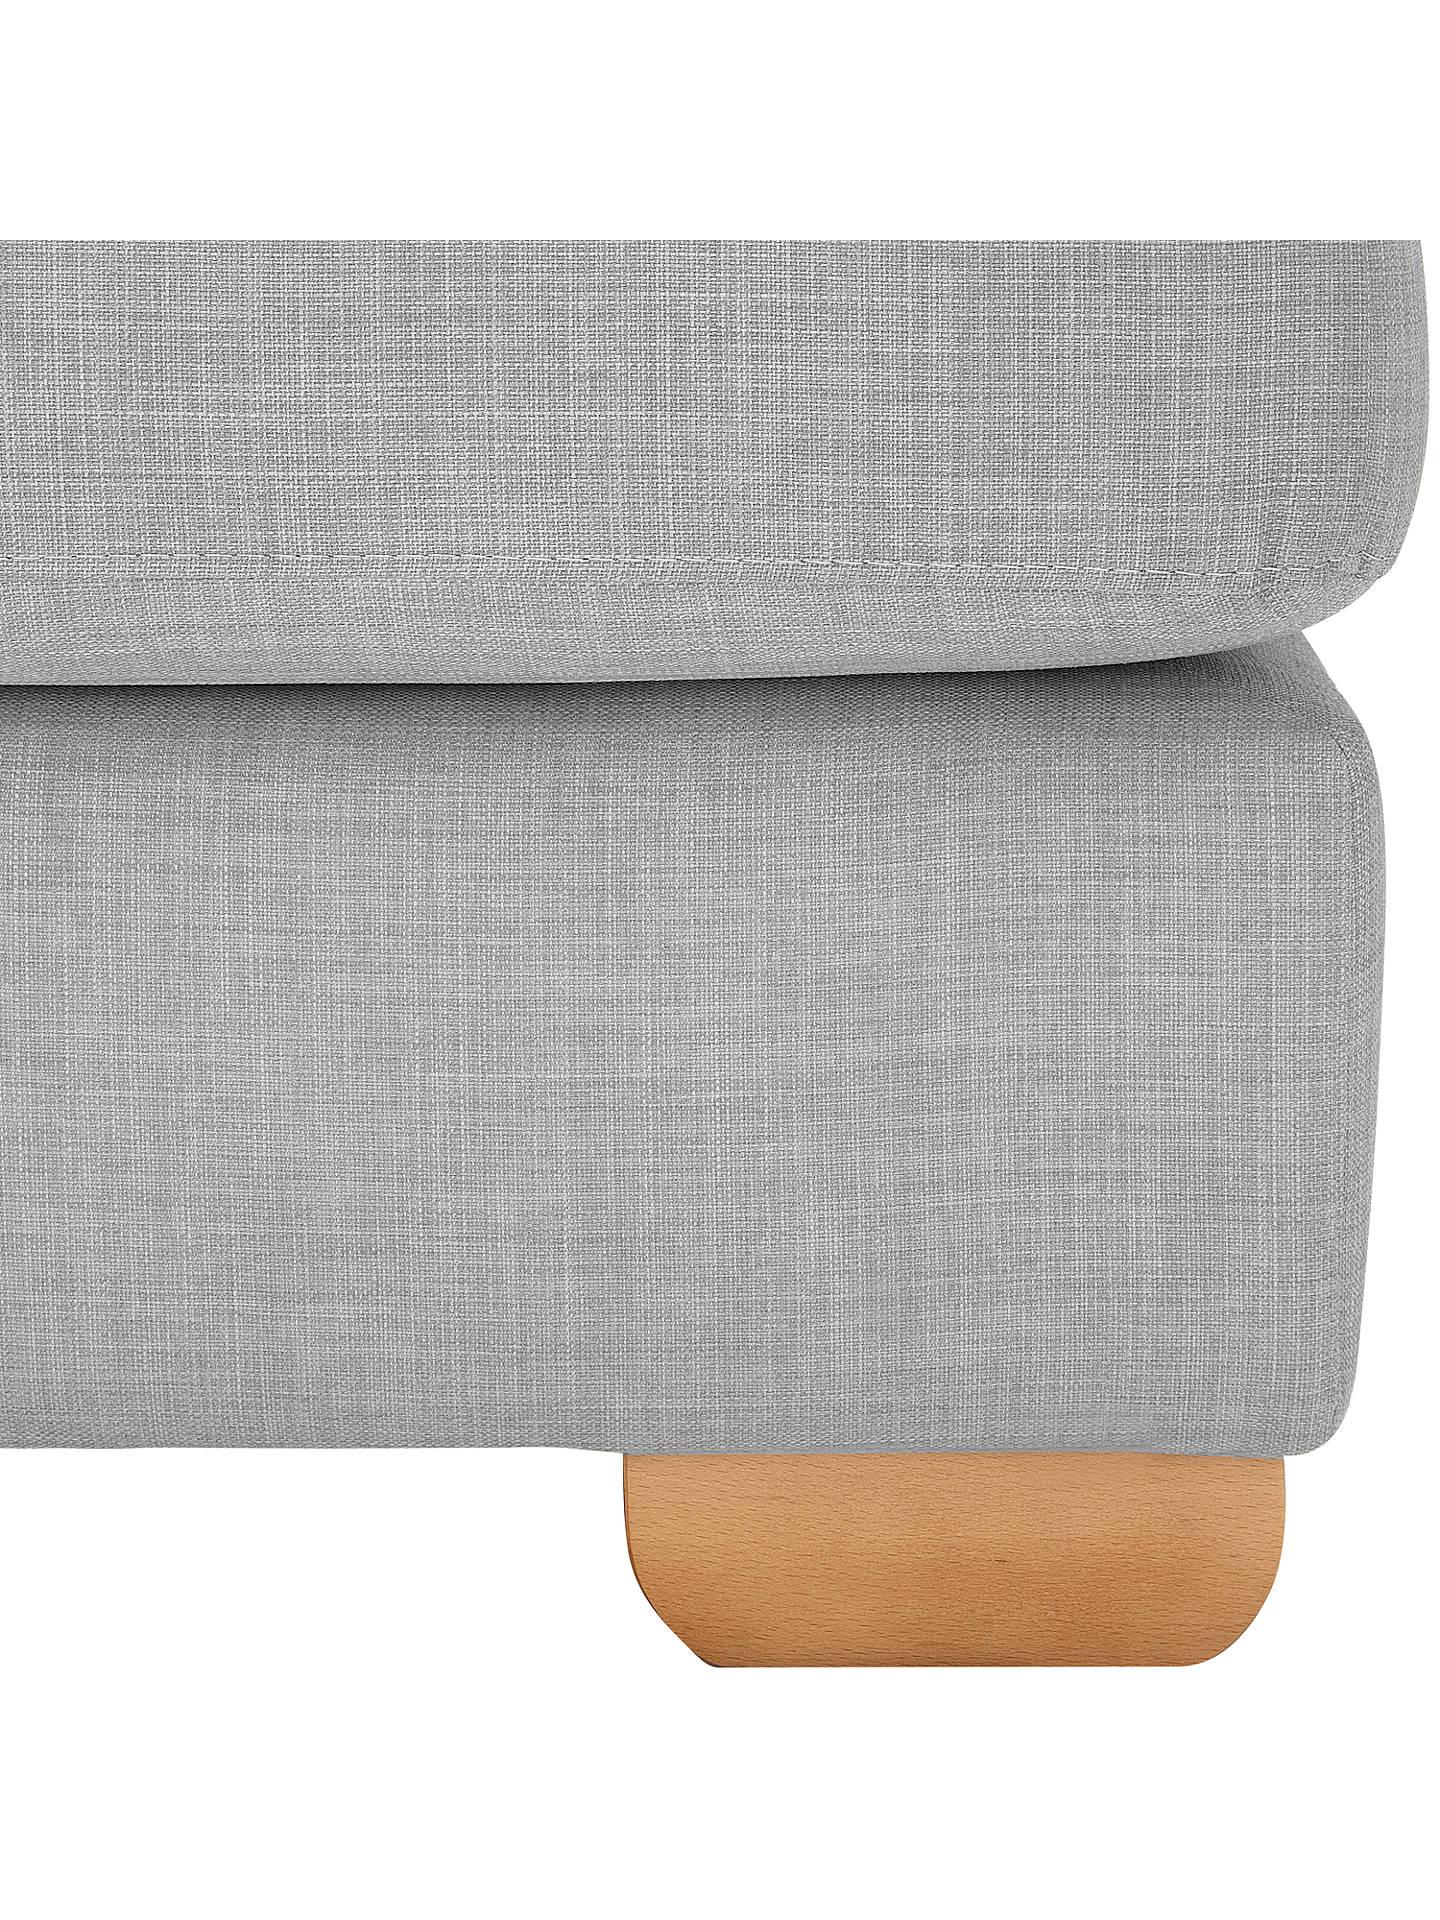 John Lewis & Partners Felix RHF Corner Chaise End Sofa